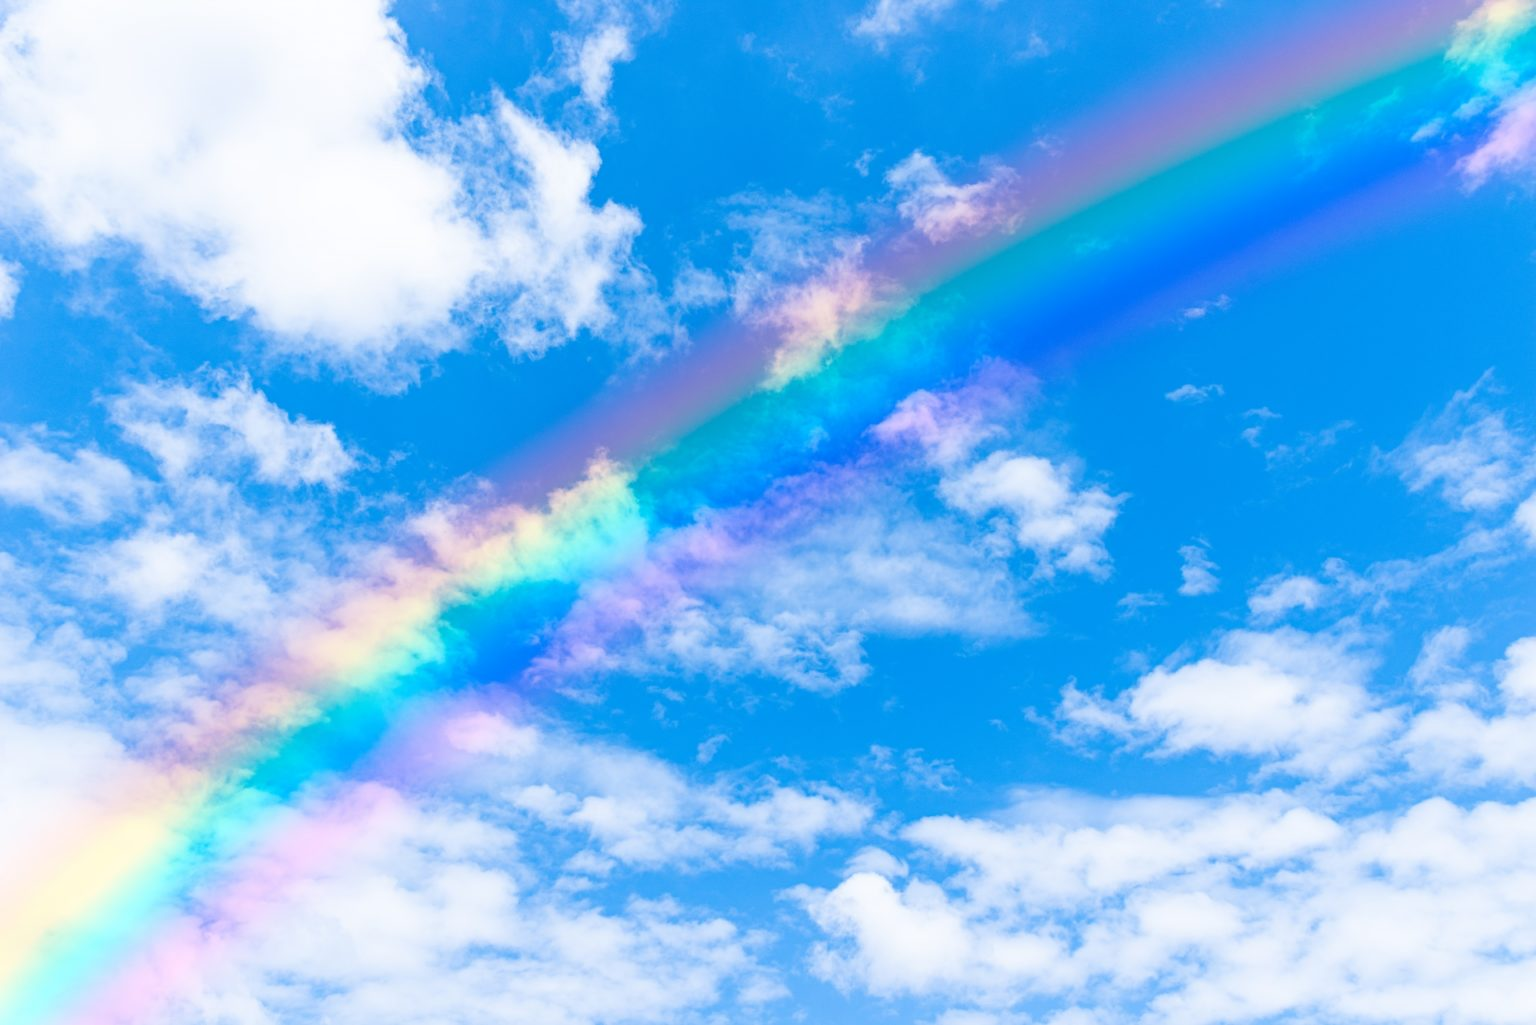 空 青空 虹